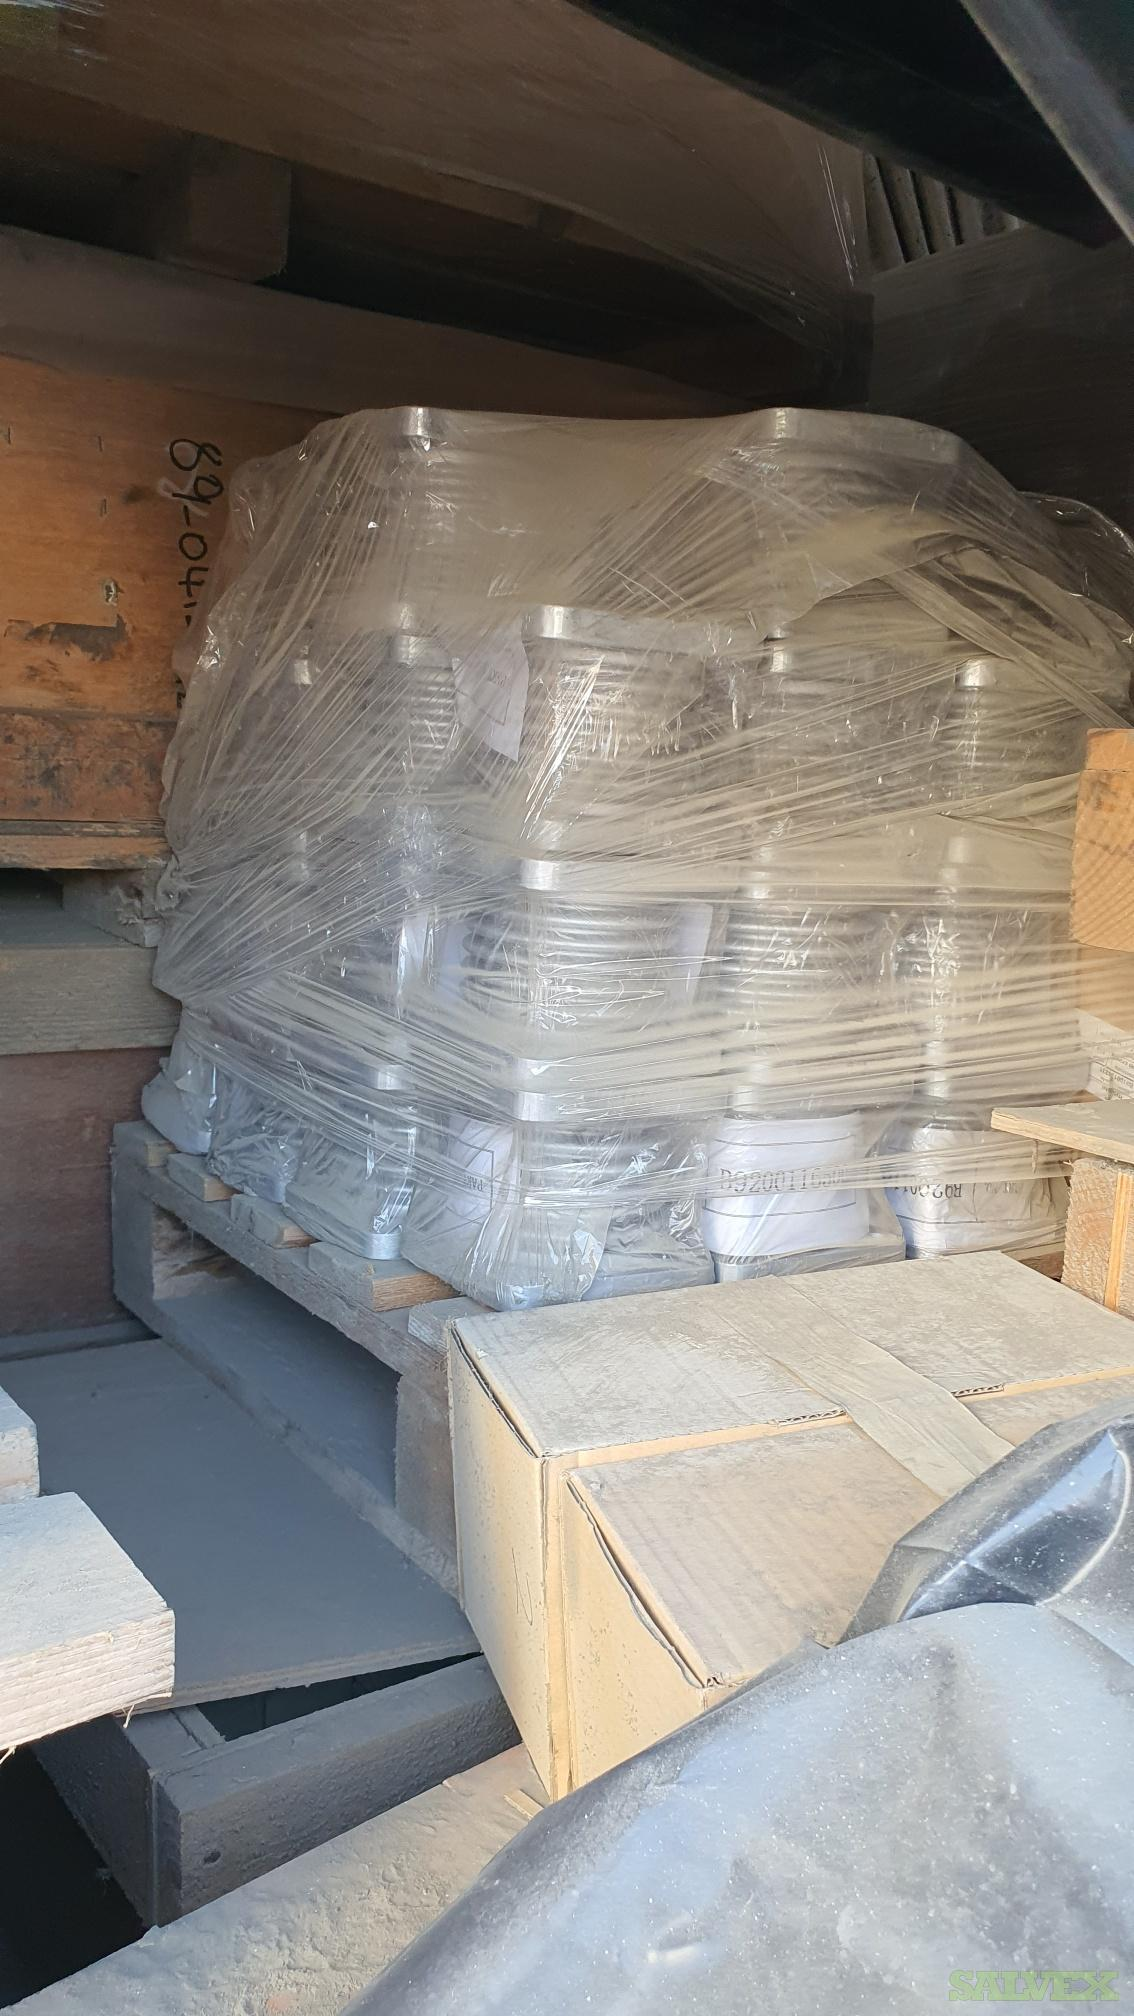 Hyundai Diesel Power Generator - Spare Parts: 2X2.5MW Himsen 9H25.33 (Package of 241 Items)